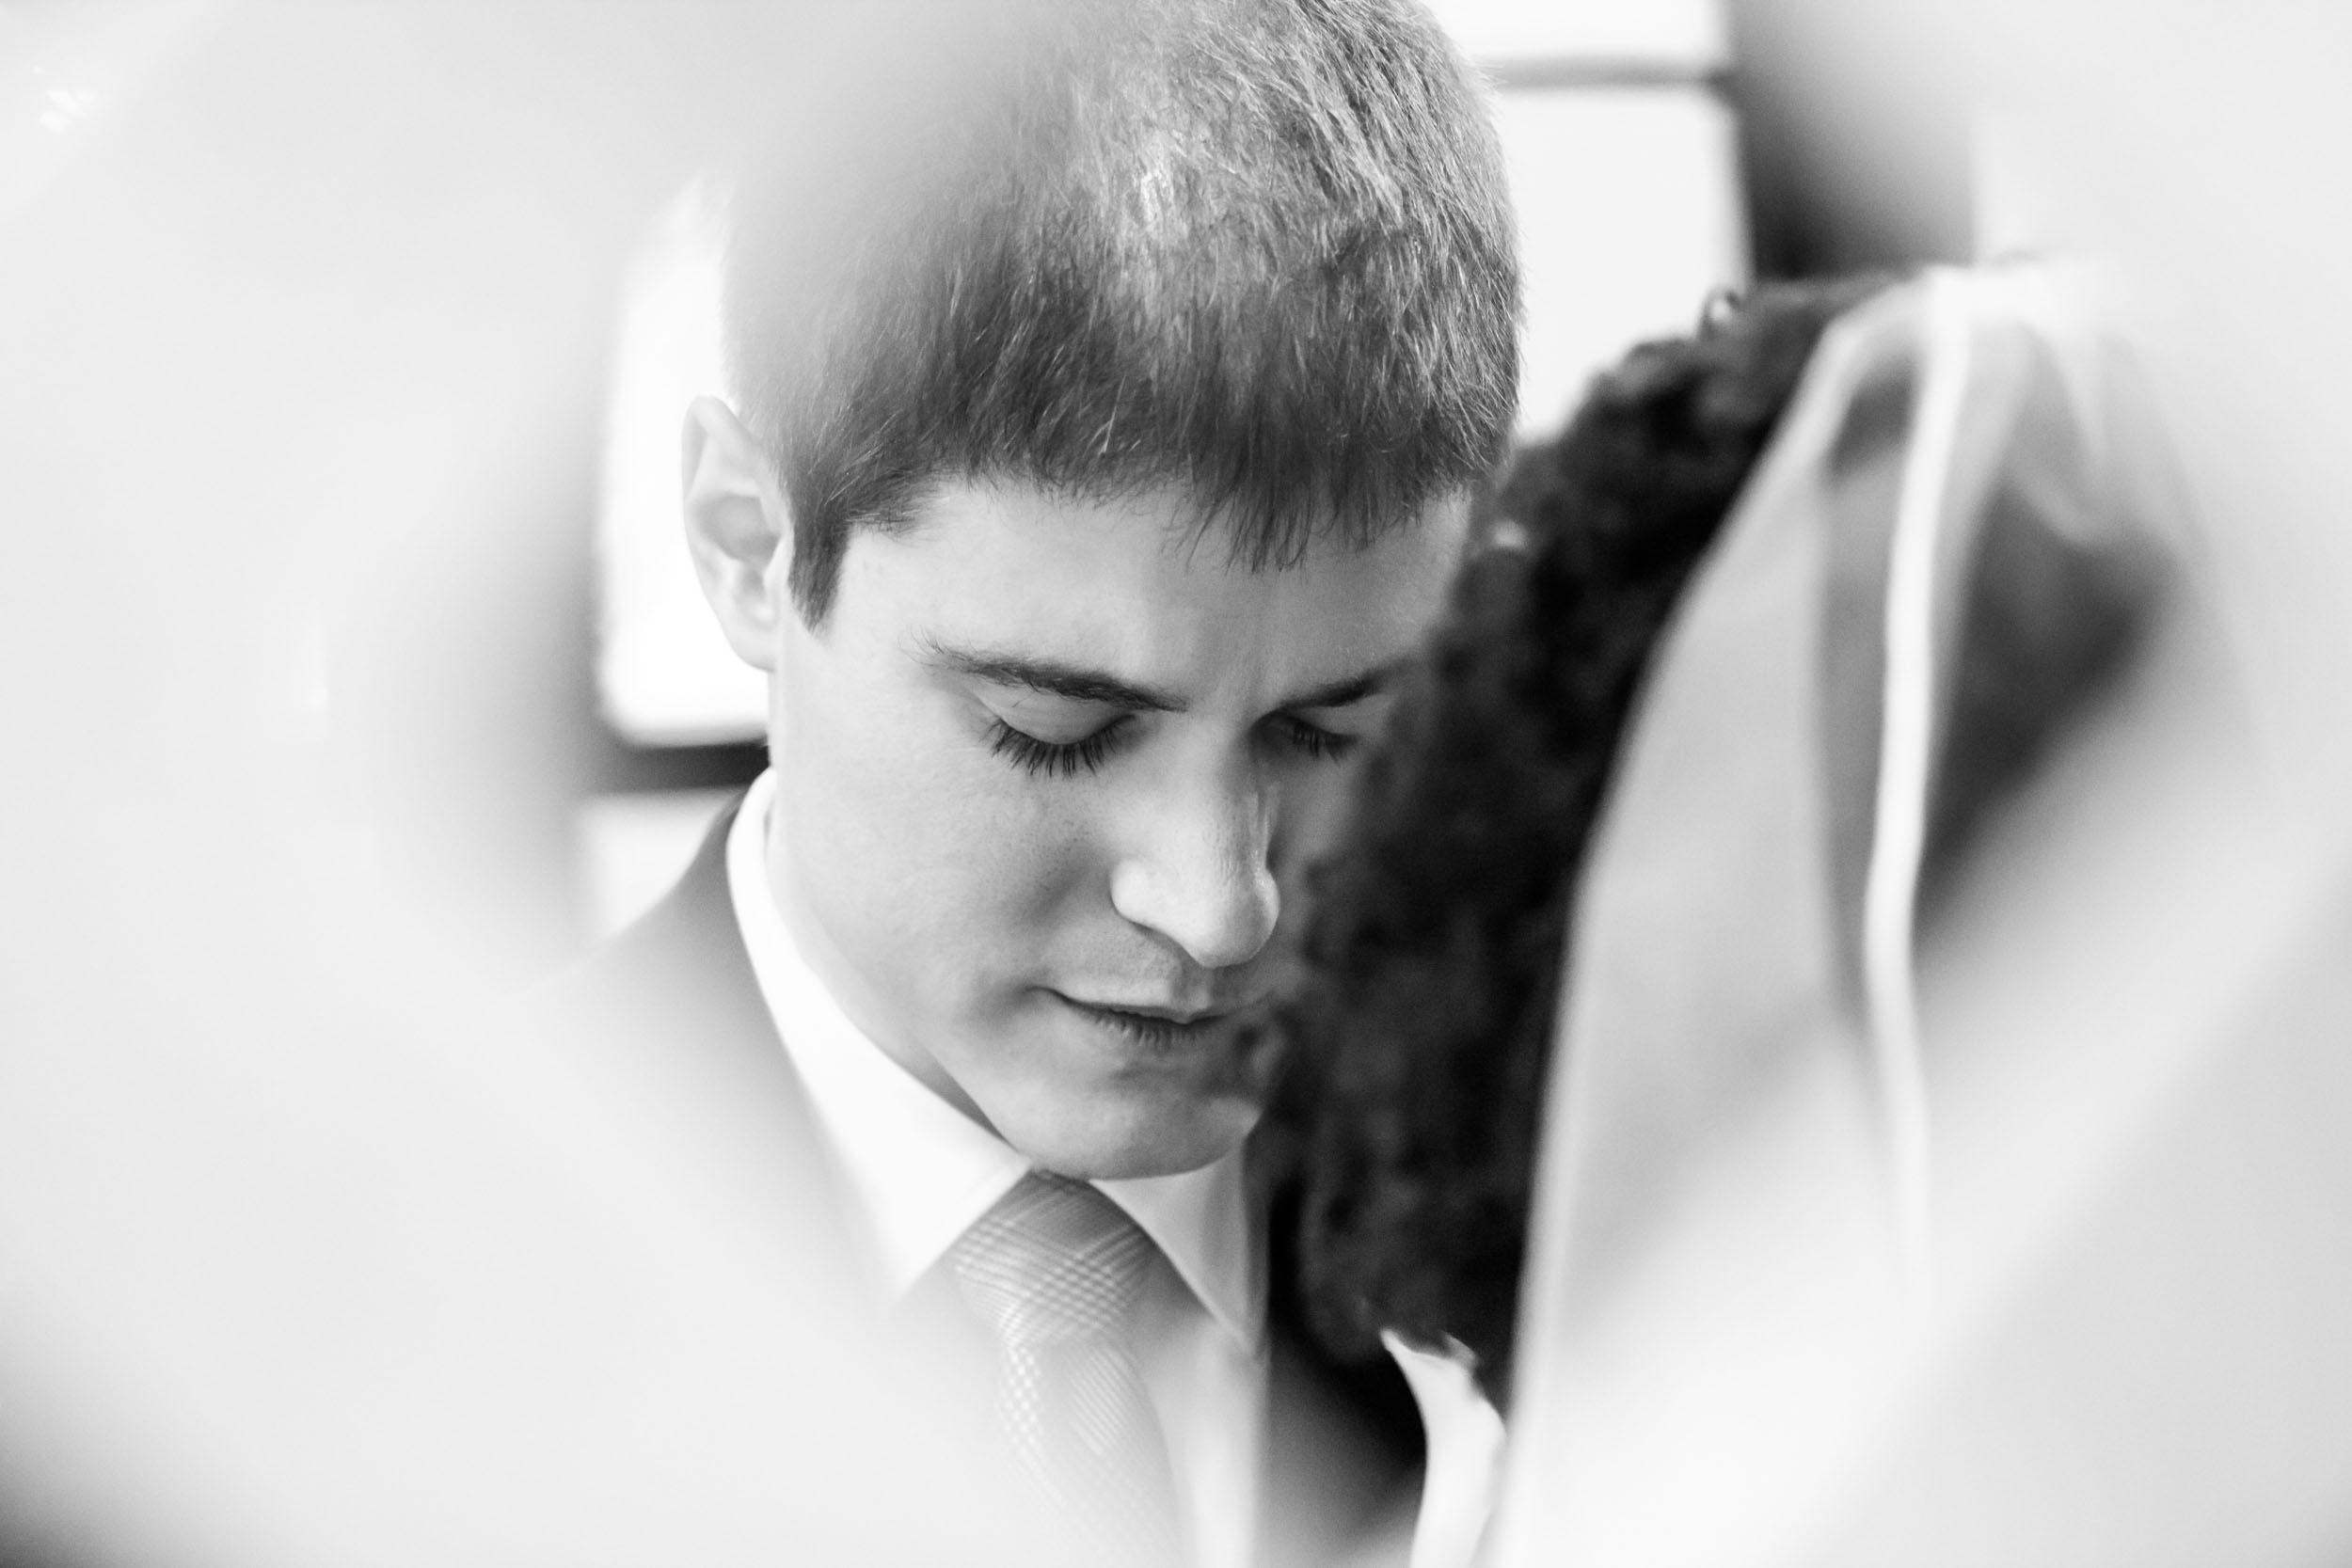 dc+metro+wedding+photographer+vadym+guliuk+photography+wedding+ceremony-2027.jpg